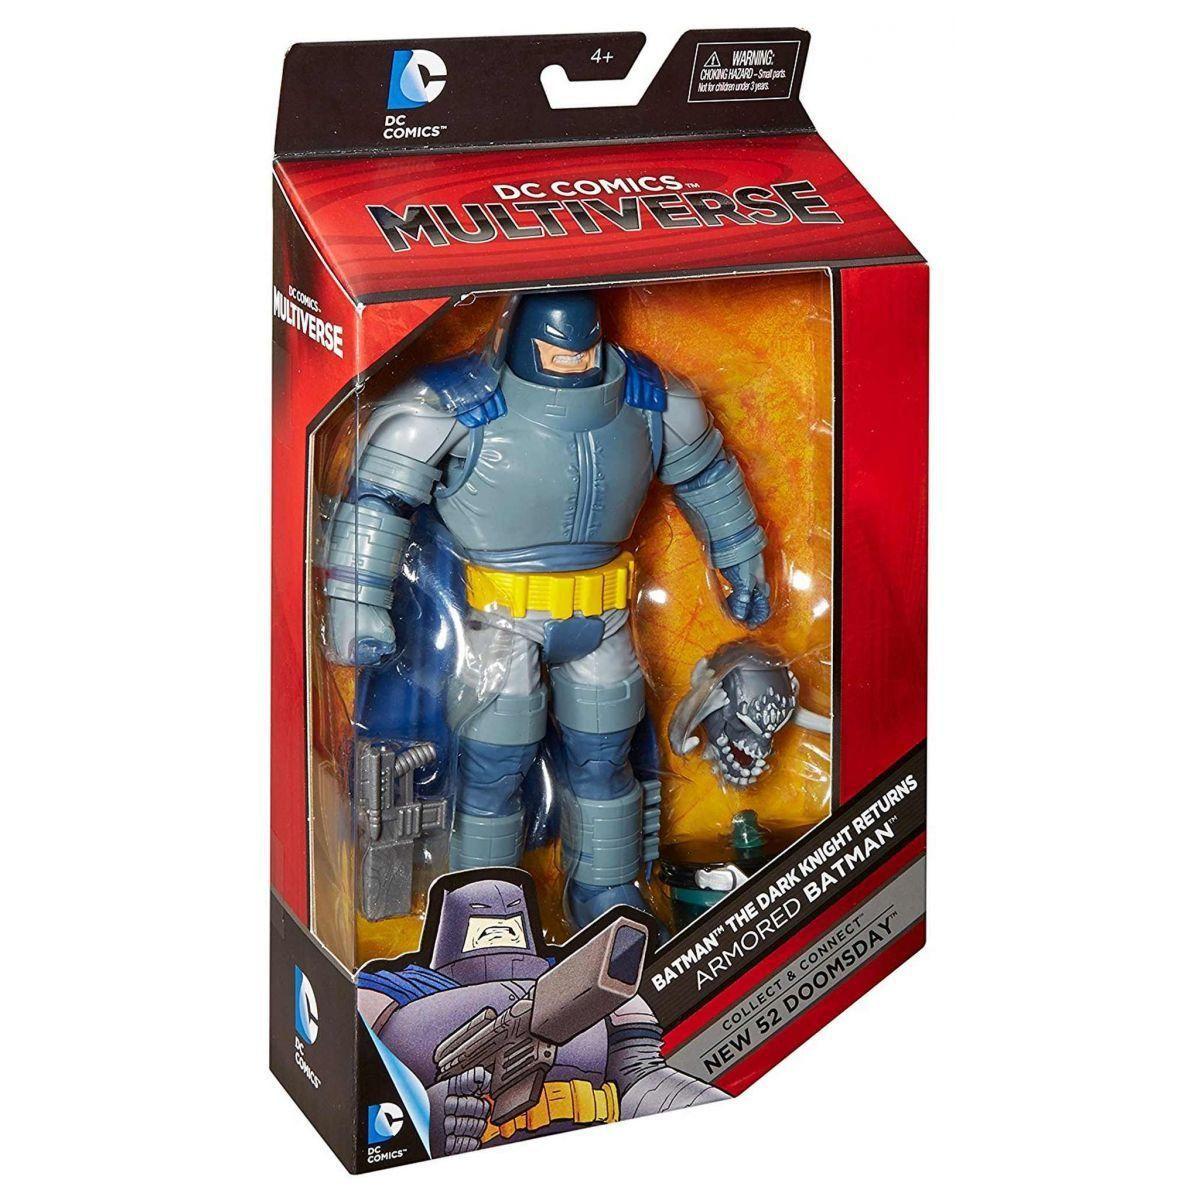 Boneco Armored Batman: DC Comics Multiverse: The Dark Knight Returns - Mattel